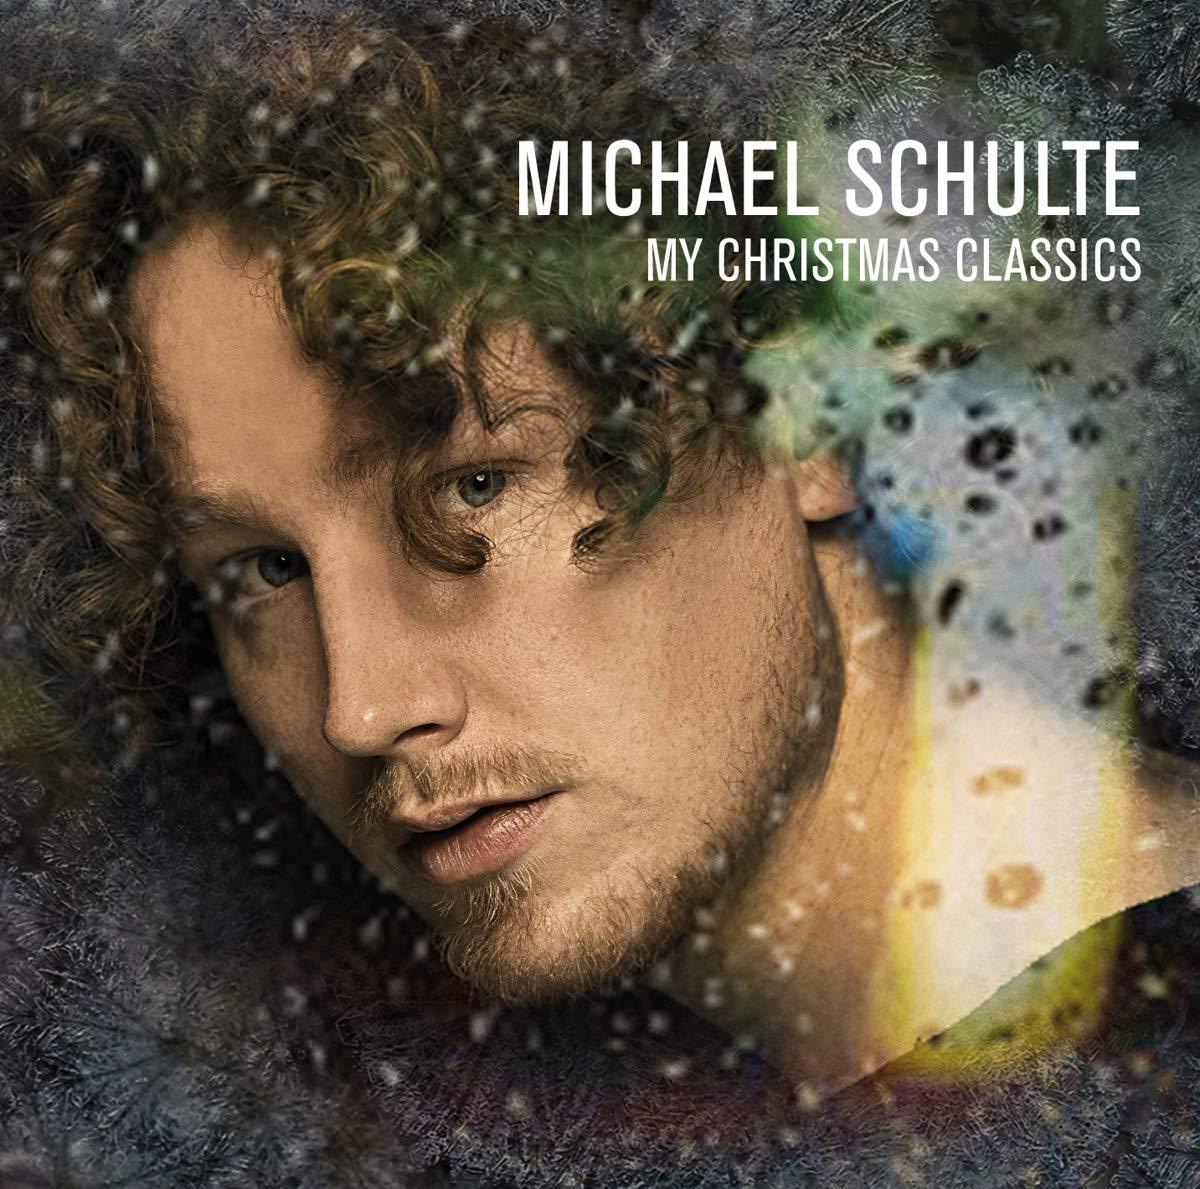 My Christmas Classics 2018 - Michael Schulte: Amazon.de: Musik